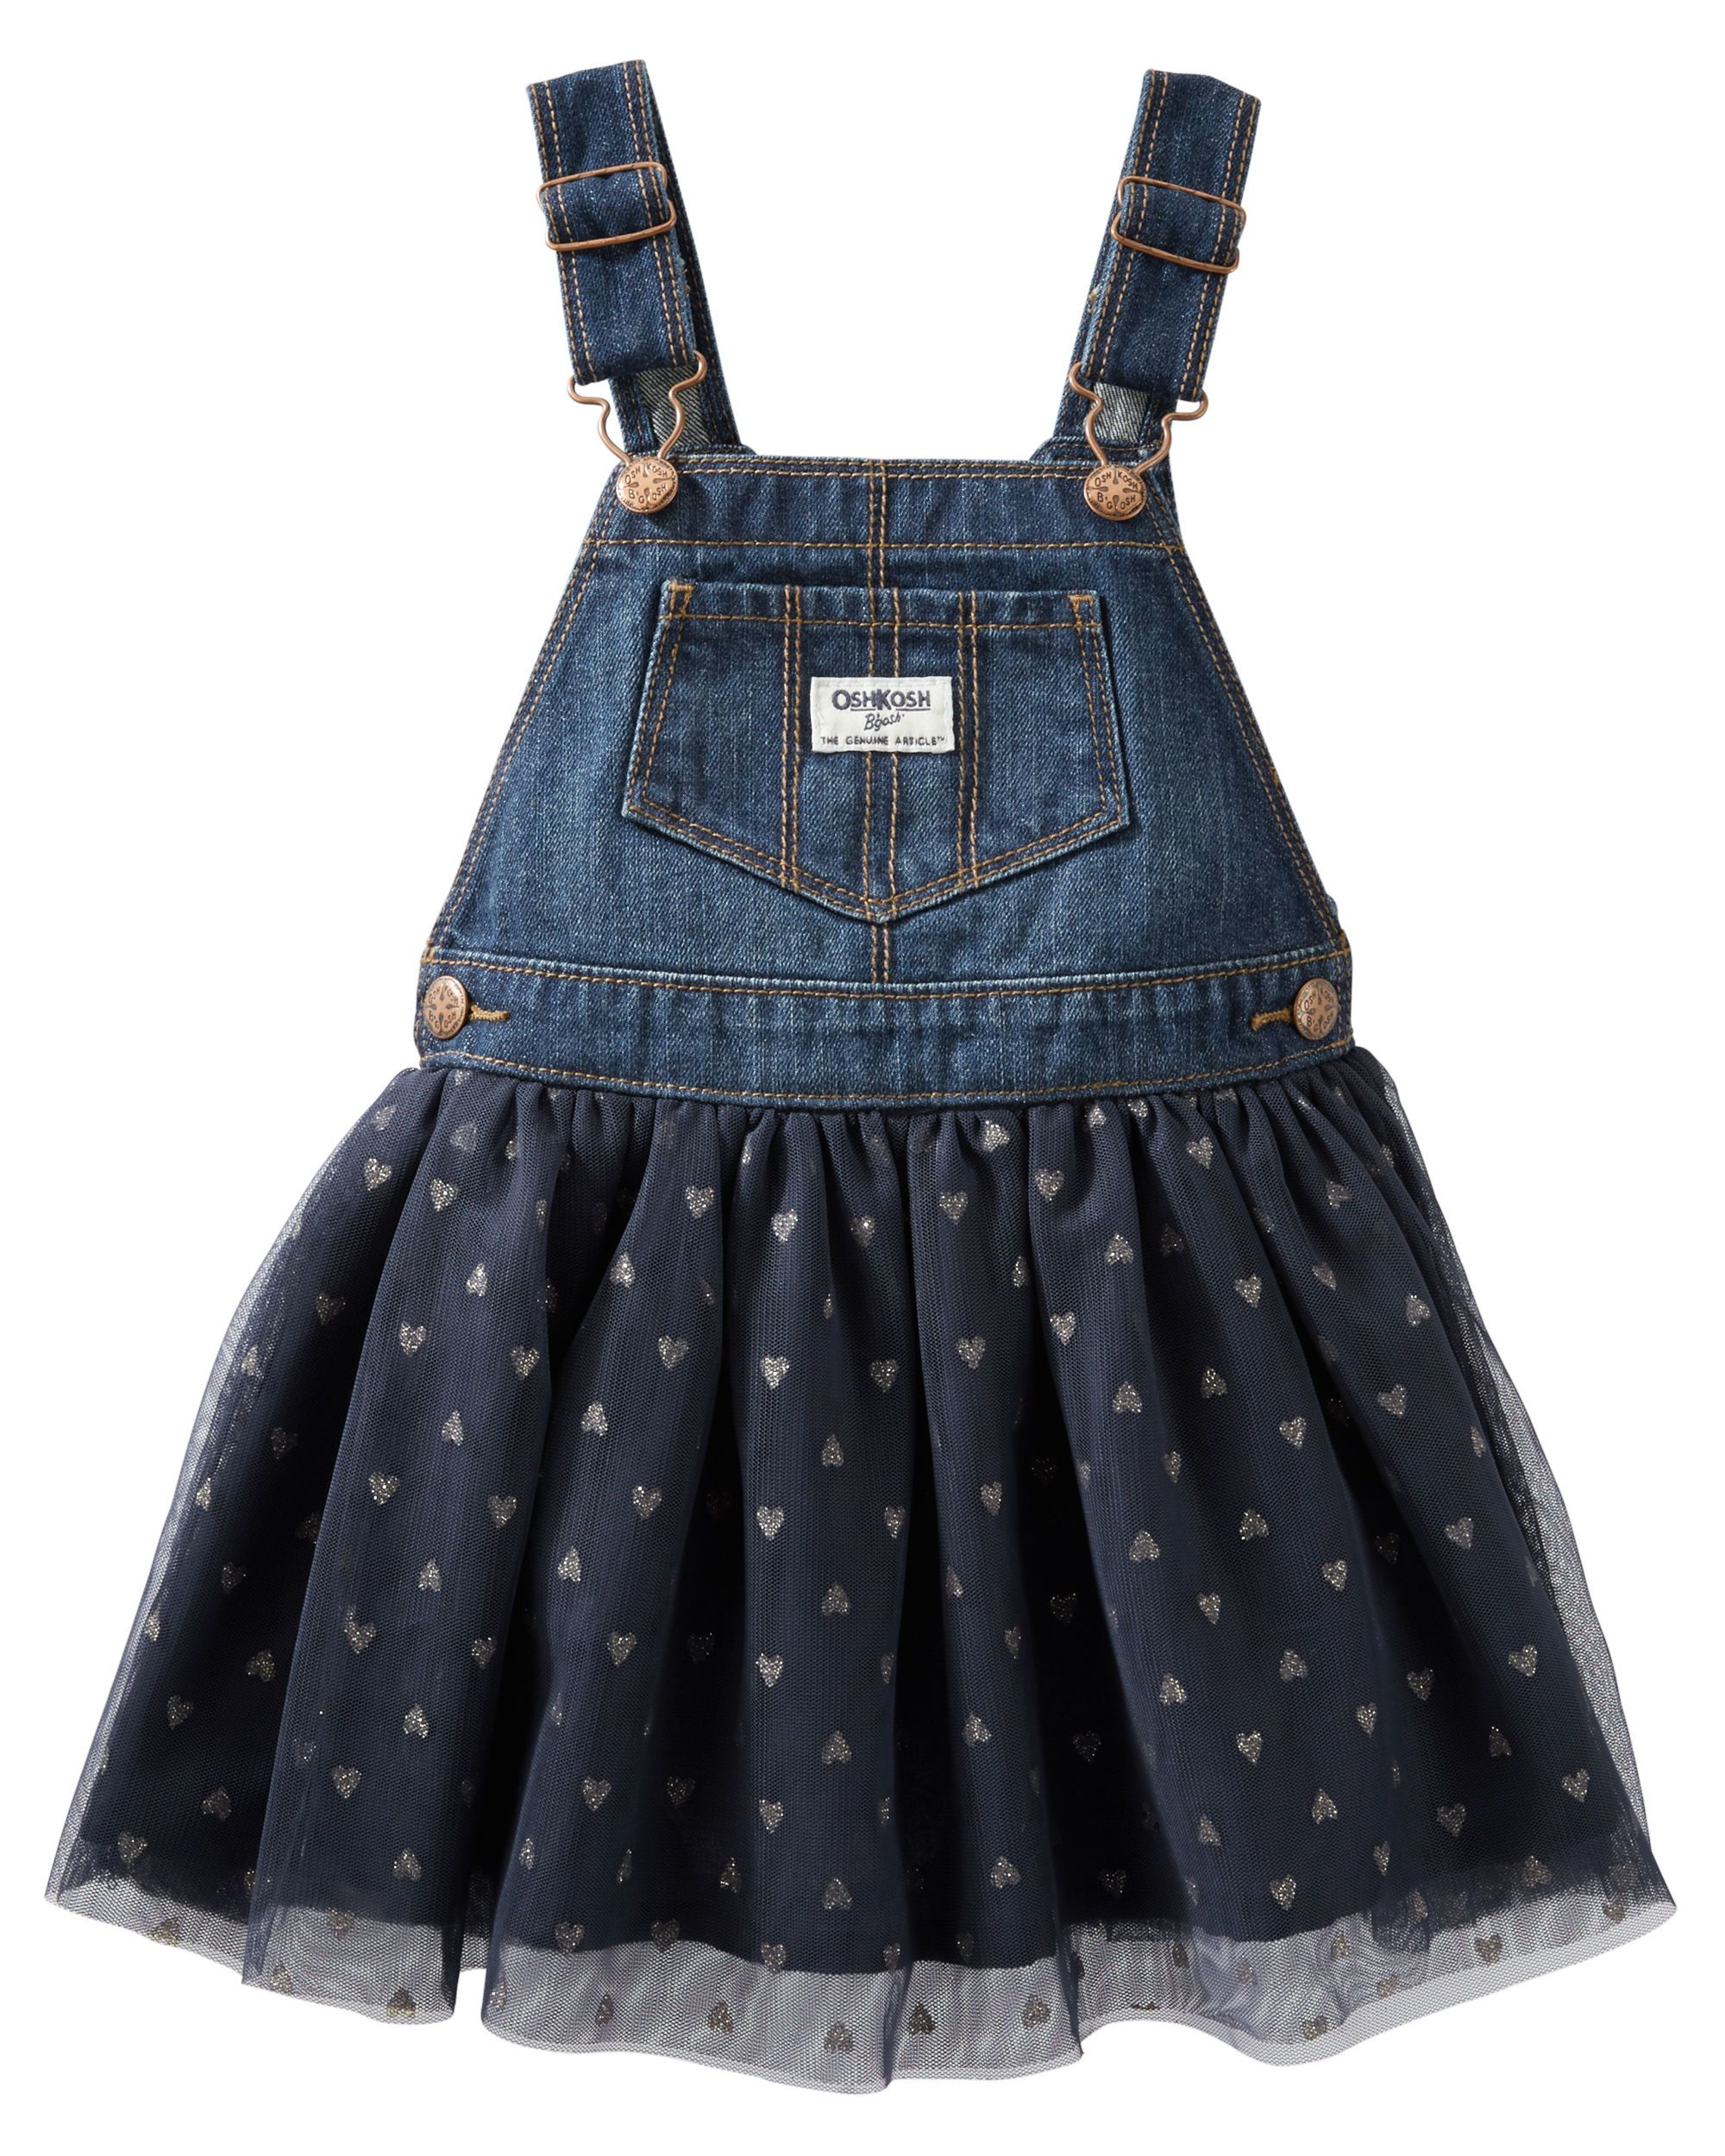 822a3cbe3ea2 Toddler Girl Sparkle Tulle Jumper